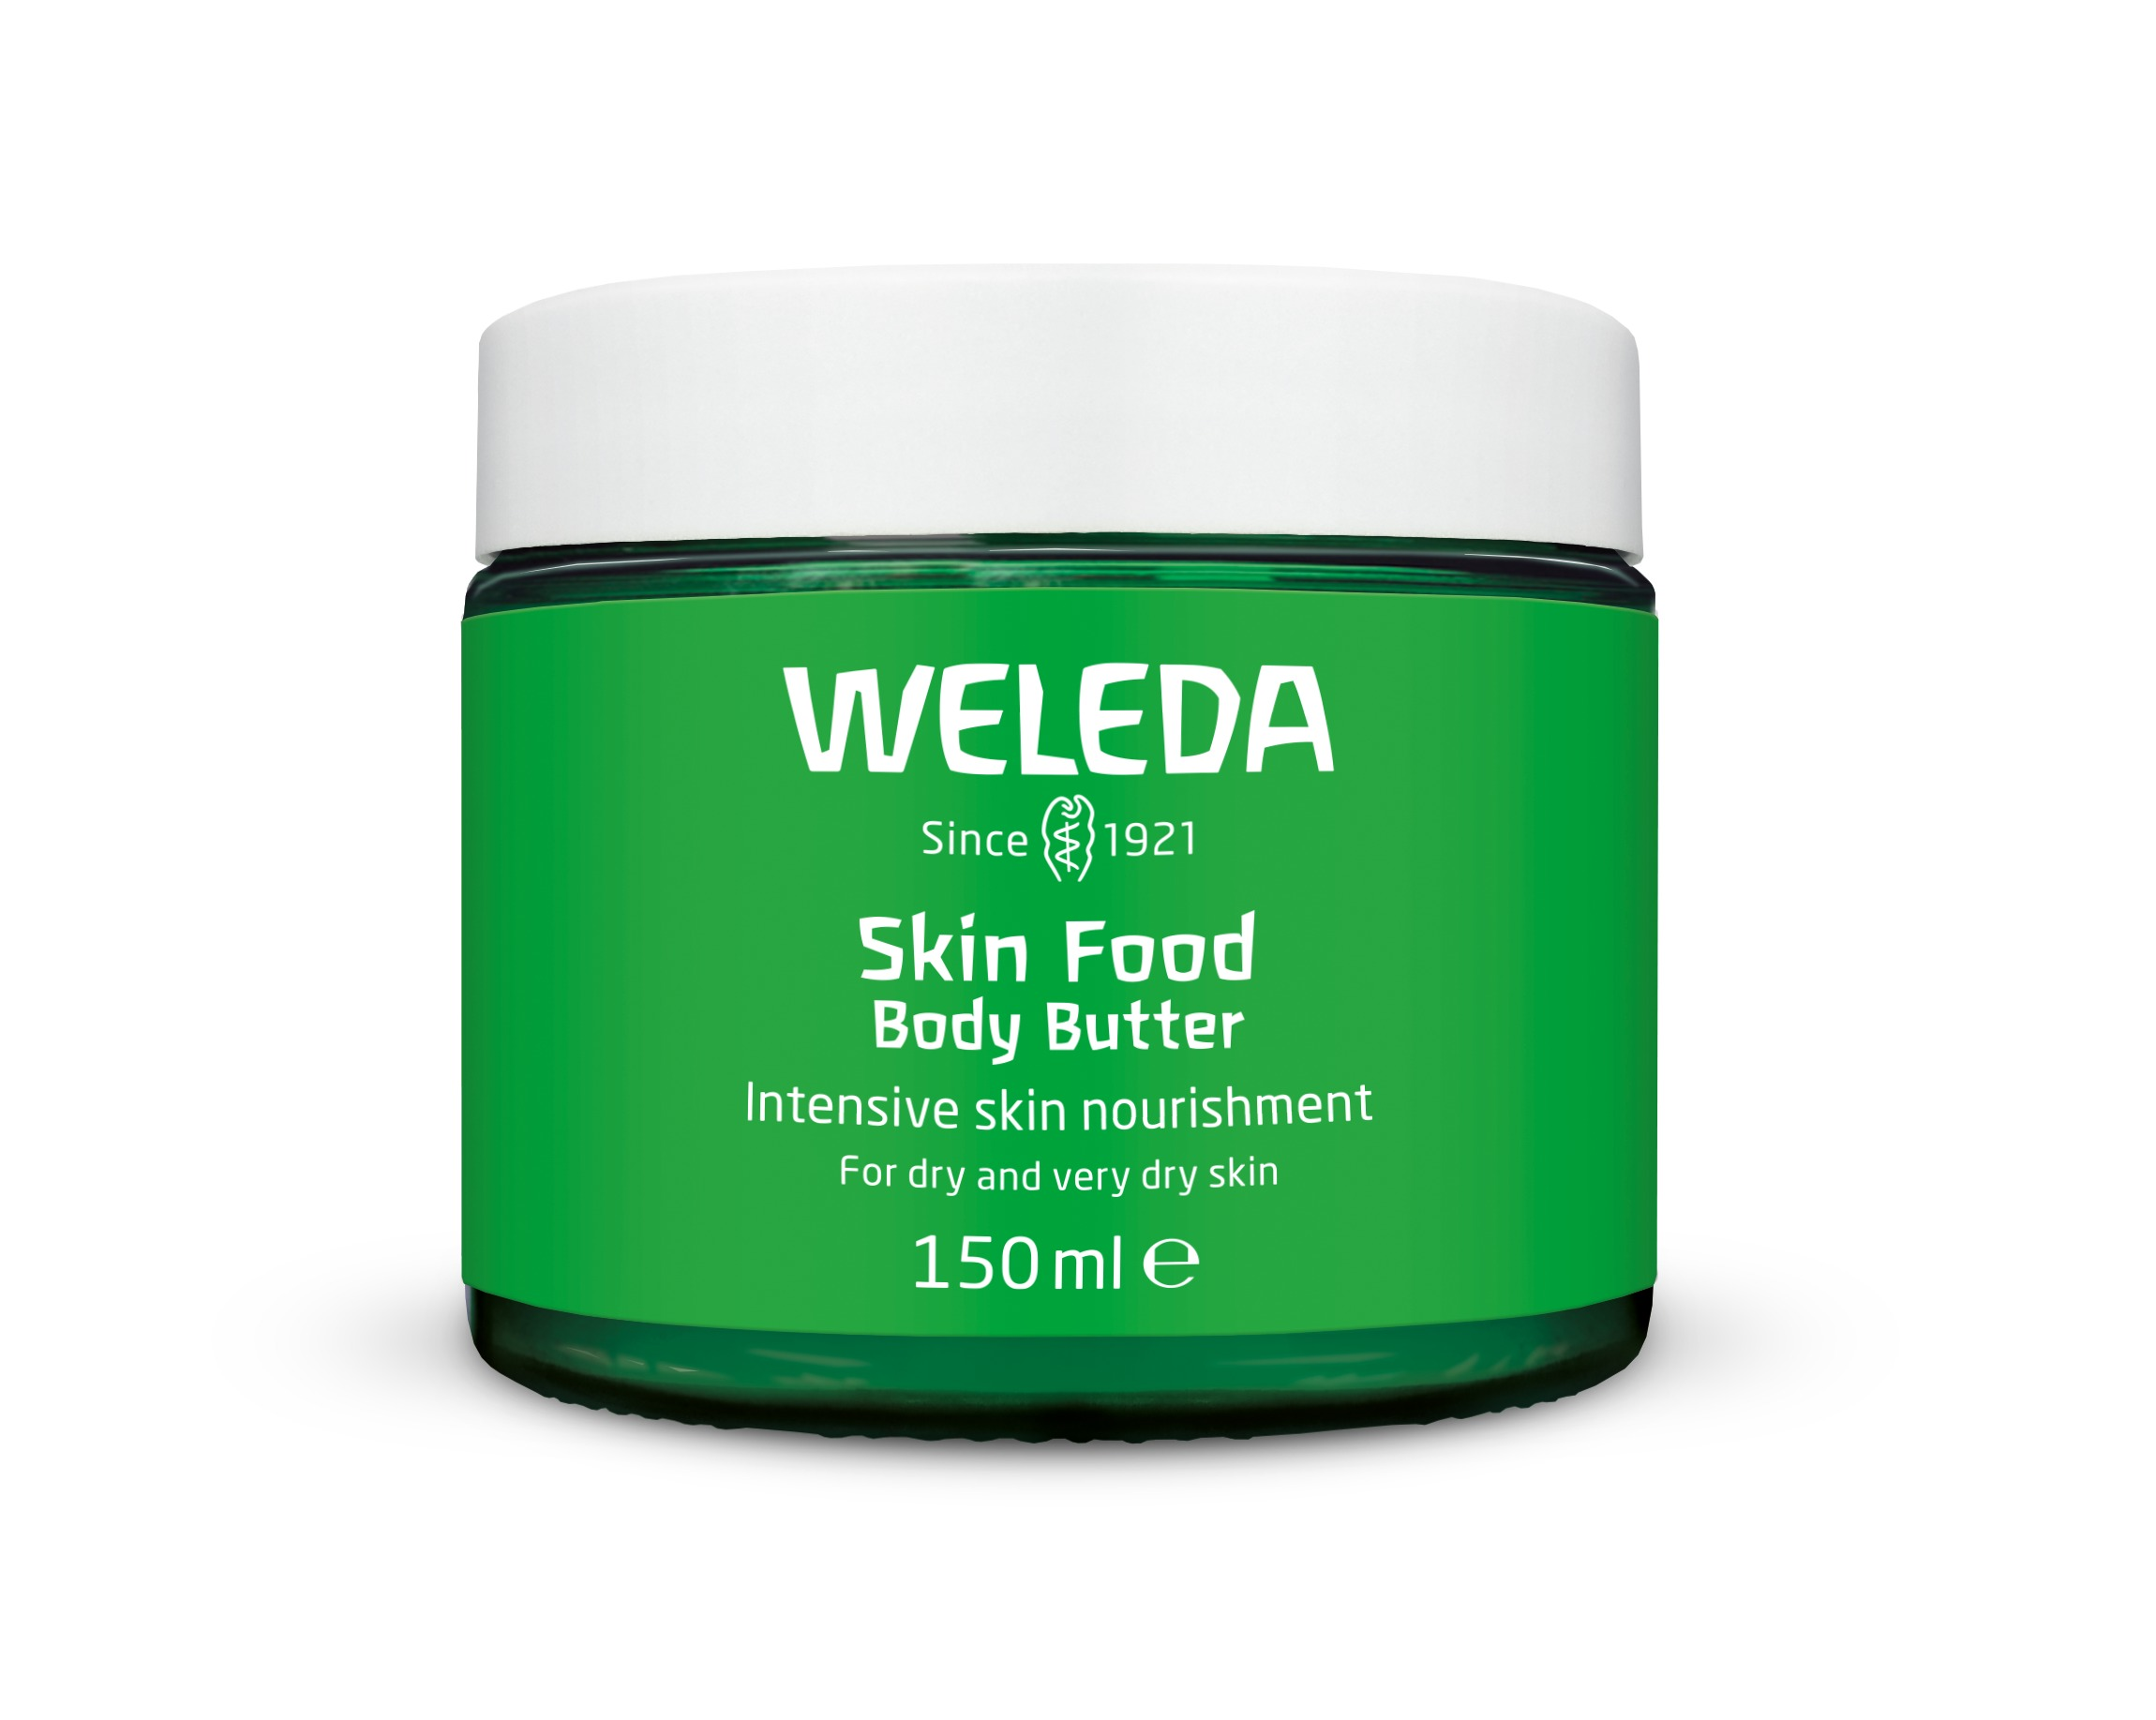 SkinFoodBodyButter_150ml -glass jar